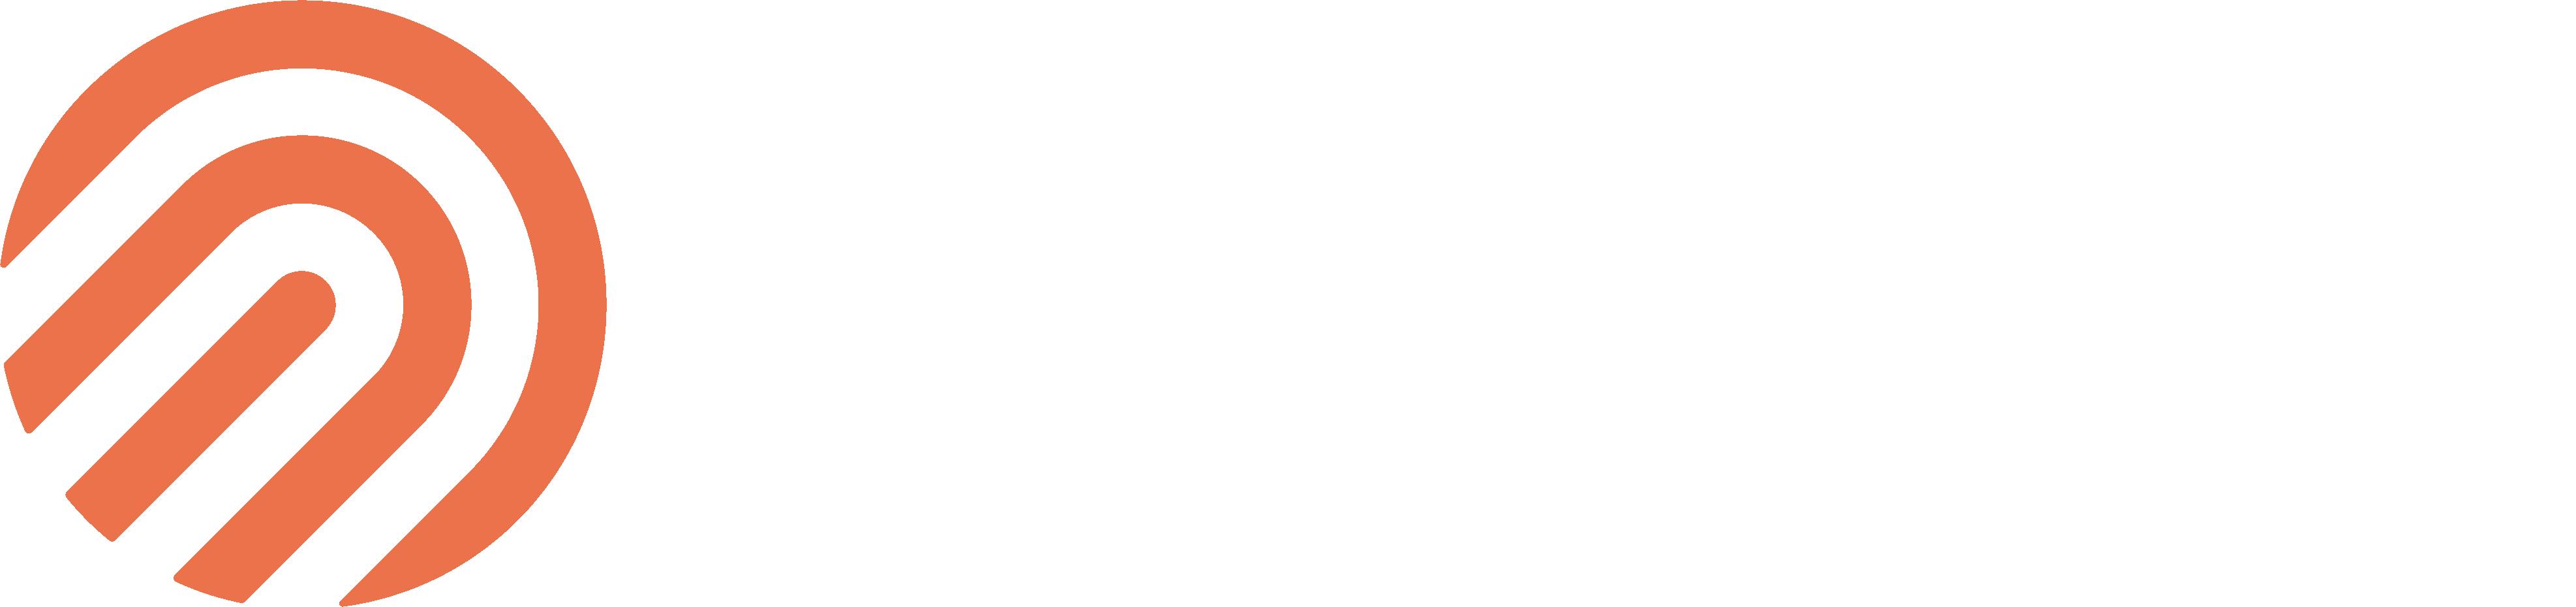 omada_logo_horizontal_papaya-white-1